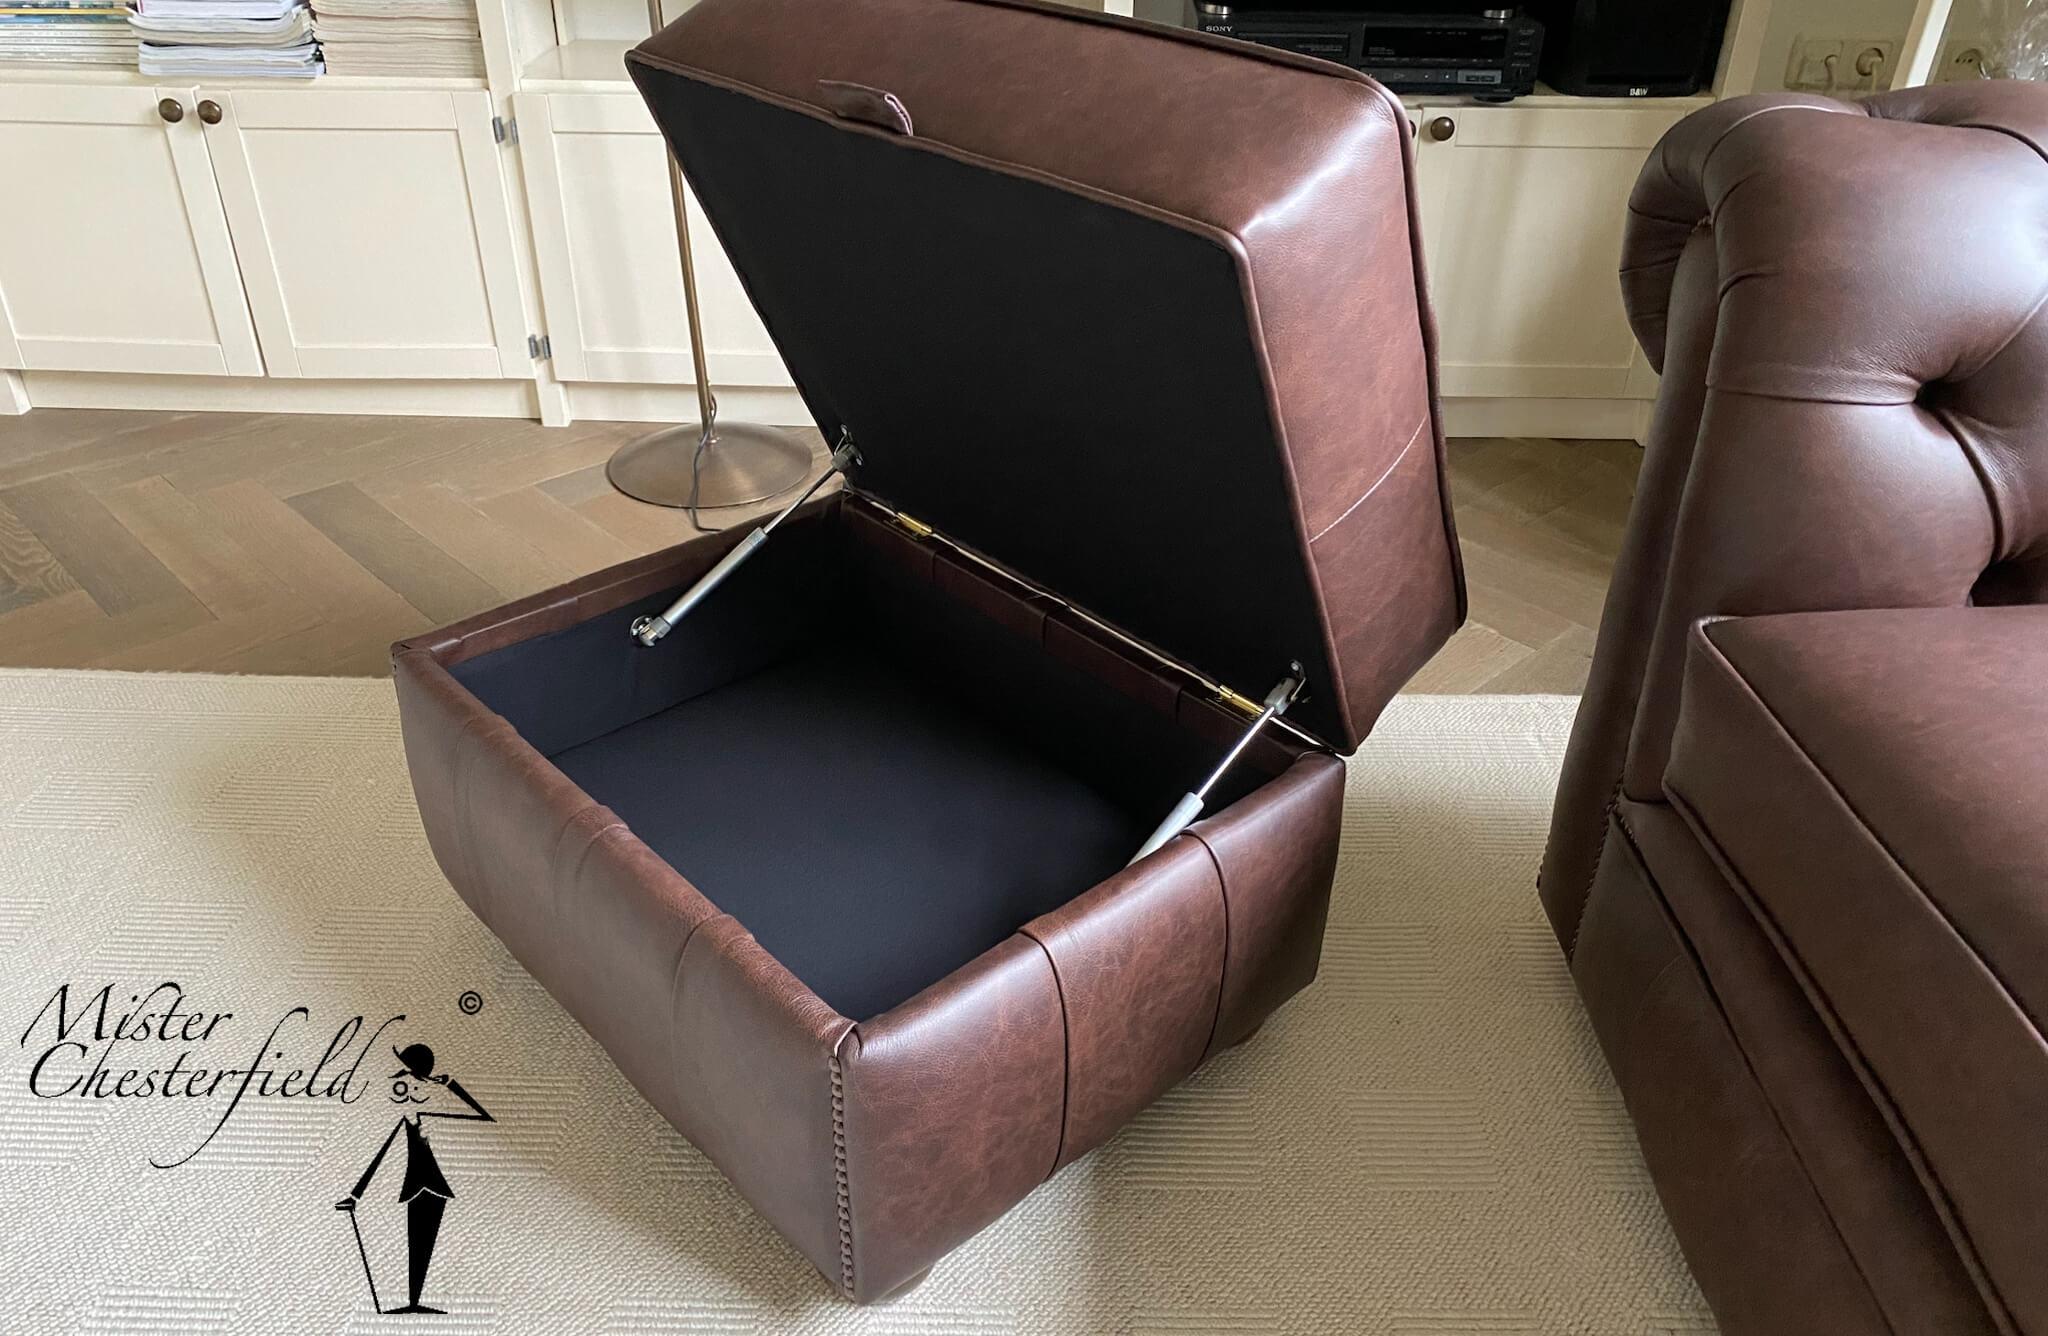 fotoboek-chesterfield-hocker-box-lid-gas-struts-footstool